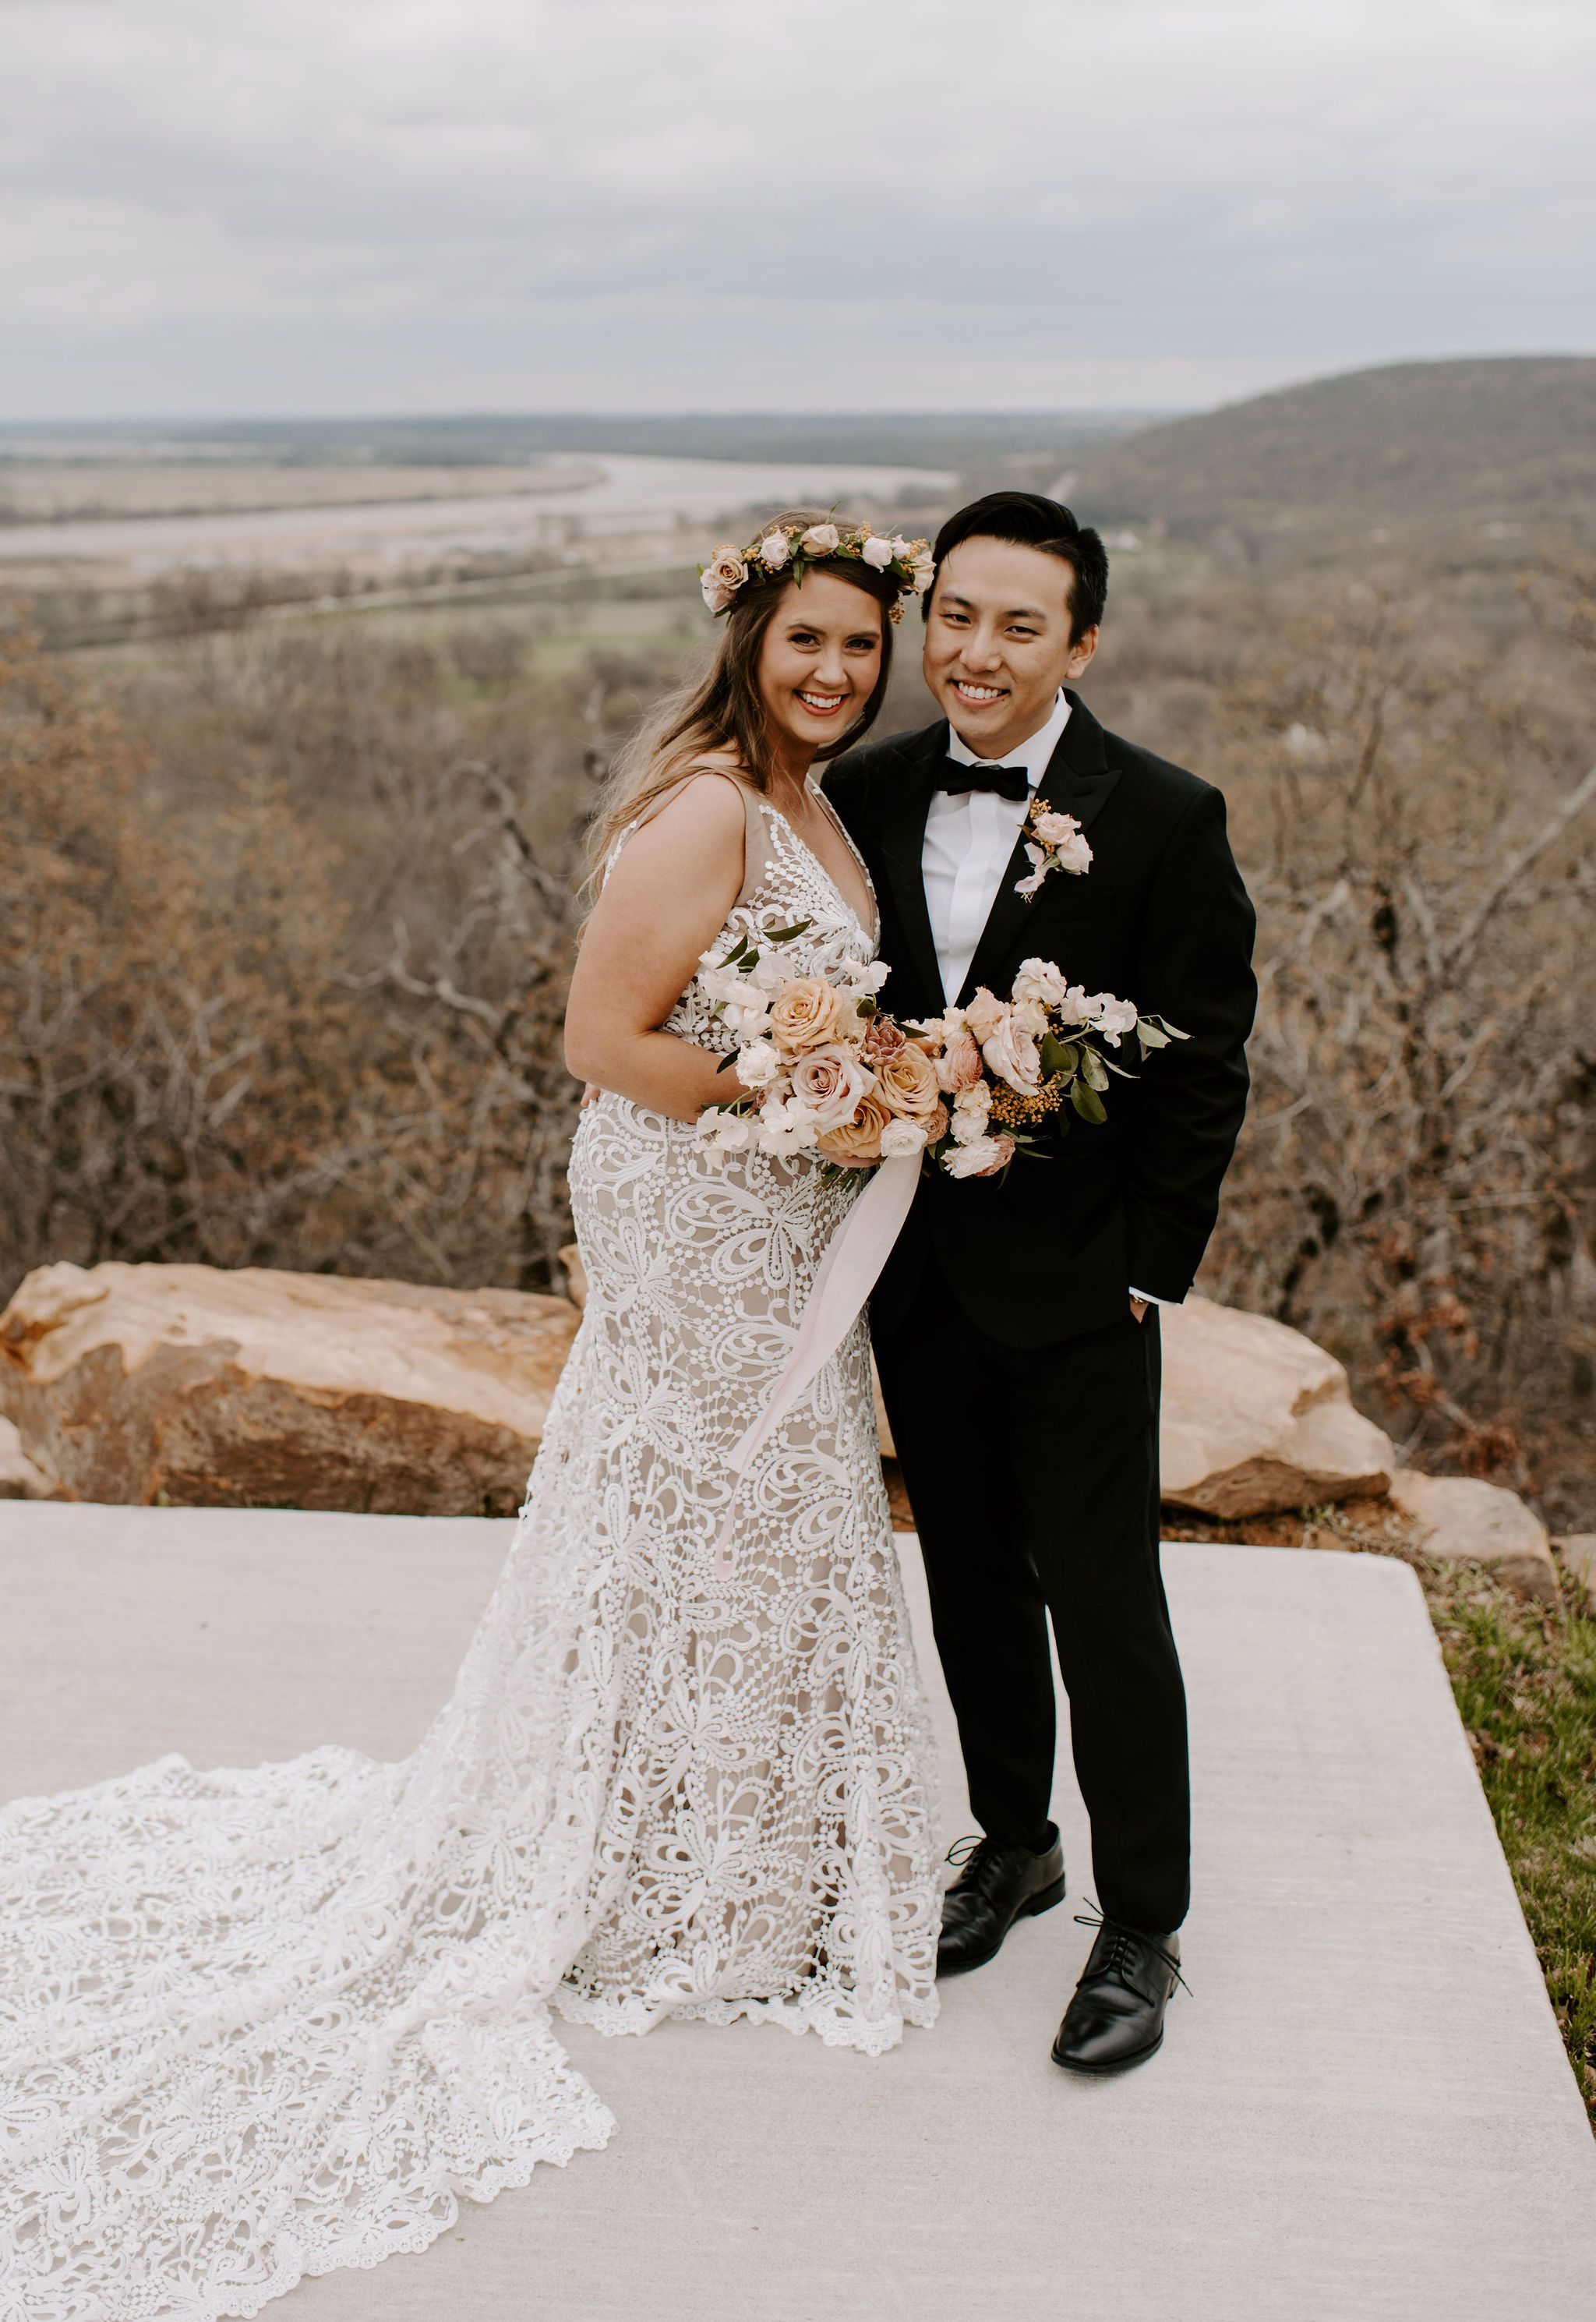 Tulsa Wedding Venue White Barn 12.jpg